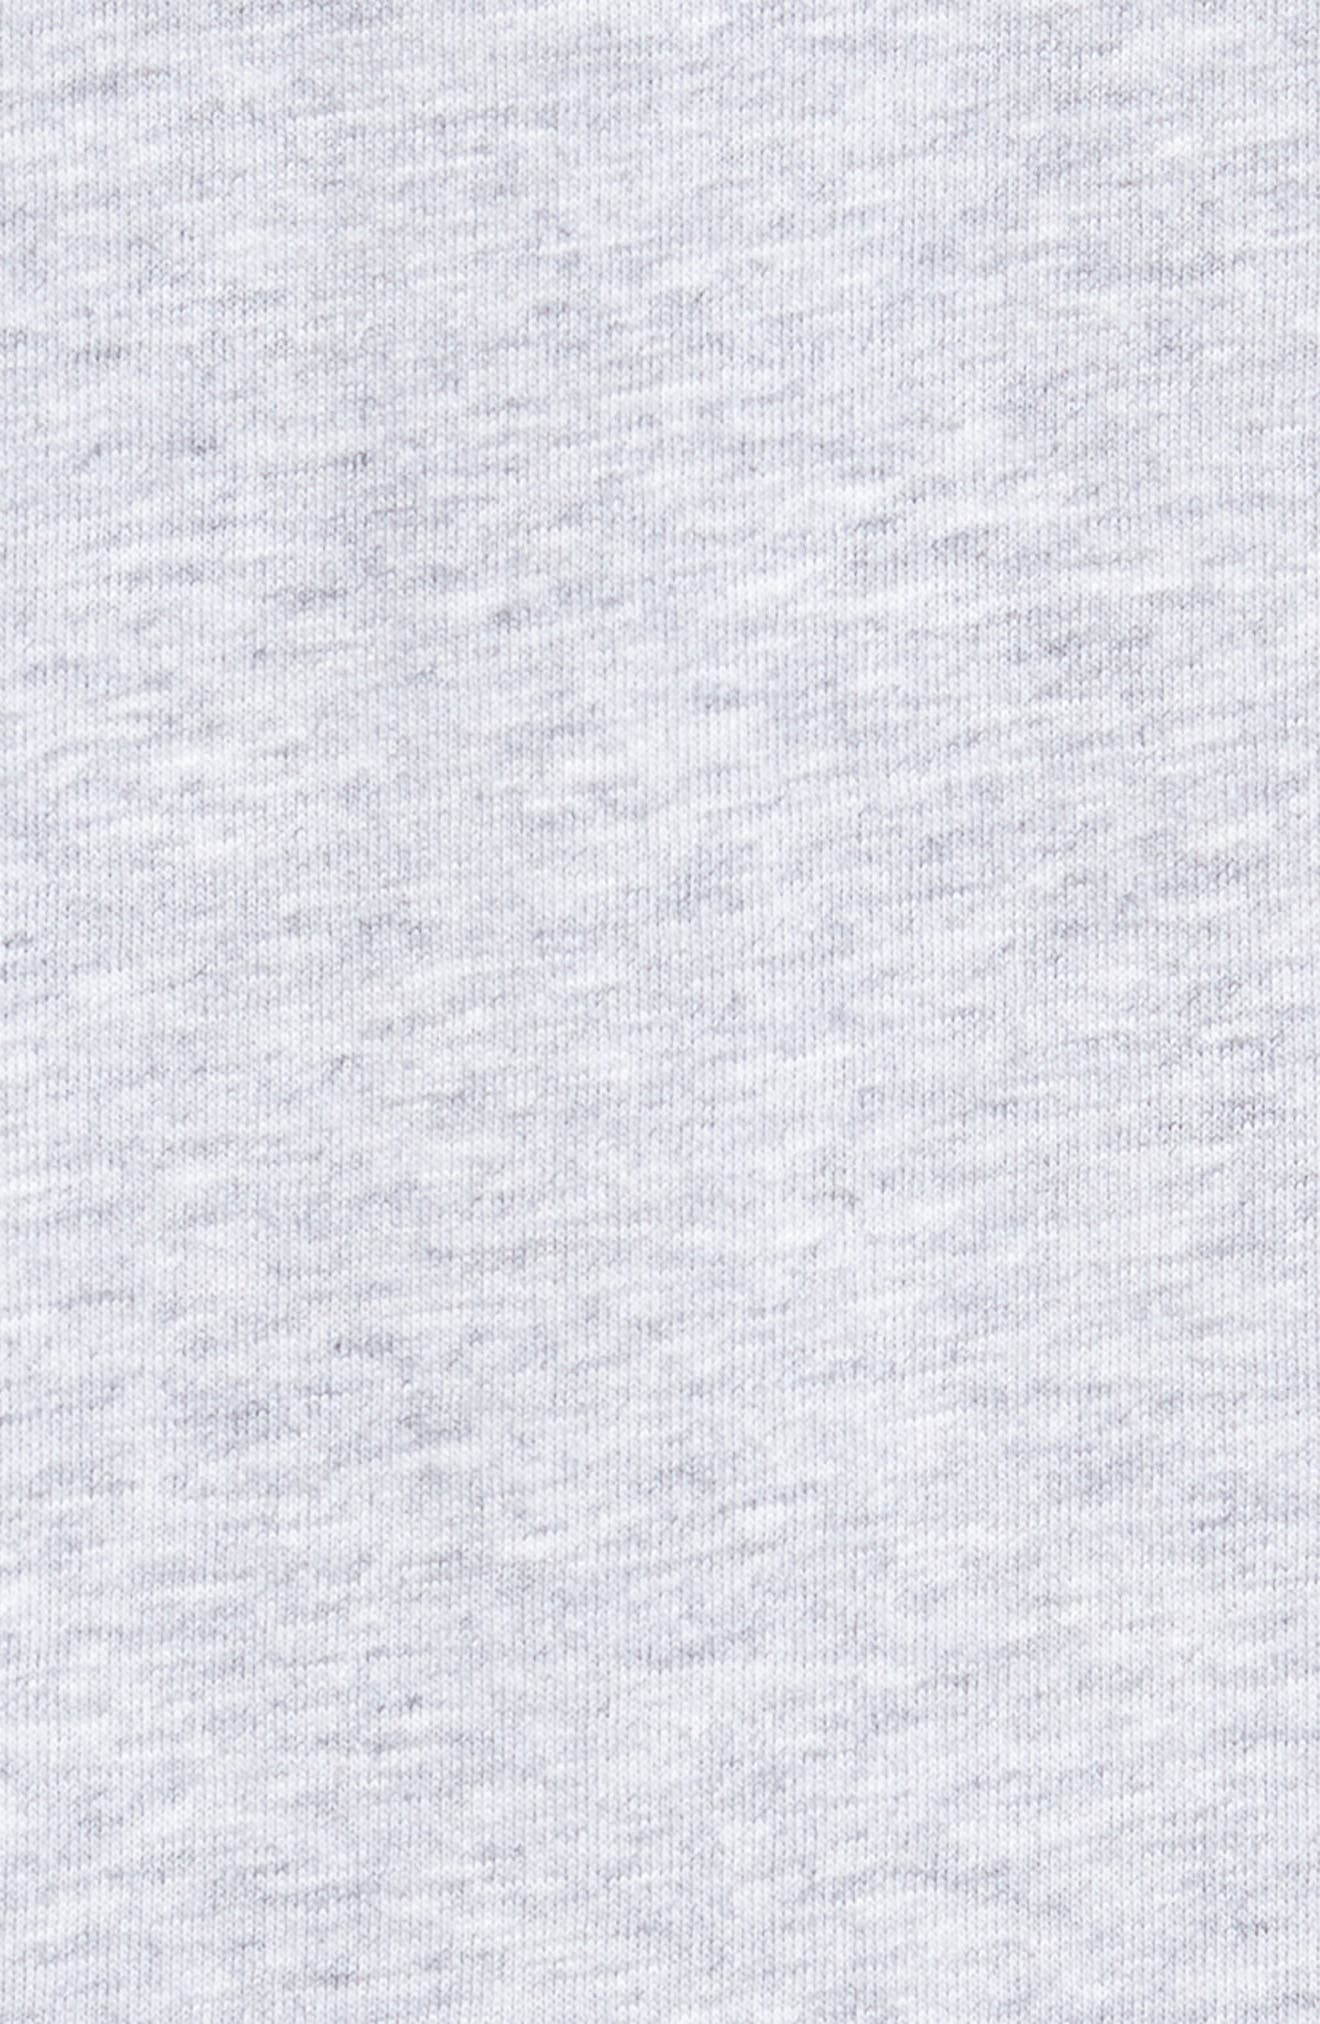 LACOSTE,                             3-Pack Slim Fit V-Neck T-Shirts,                             Alternate thumbnail 5, color,                             BLACK/ GREY/ WHITE